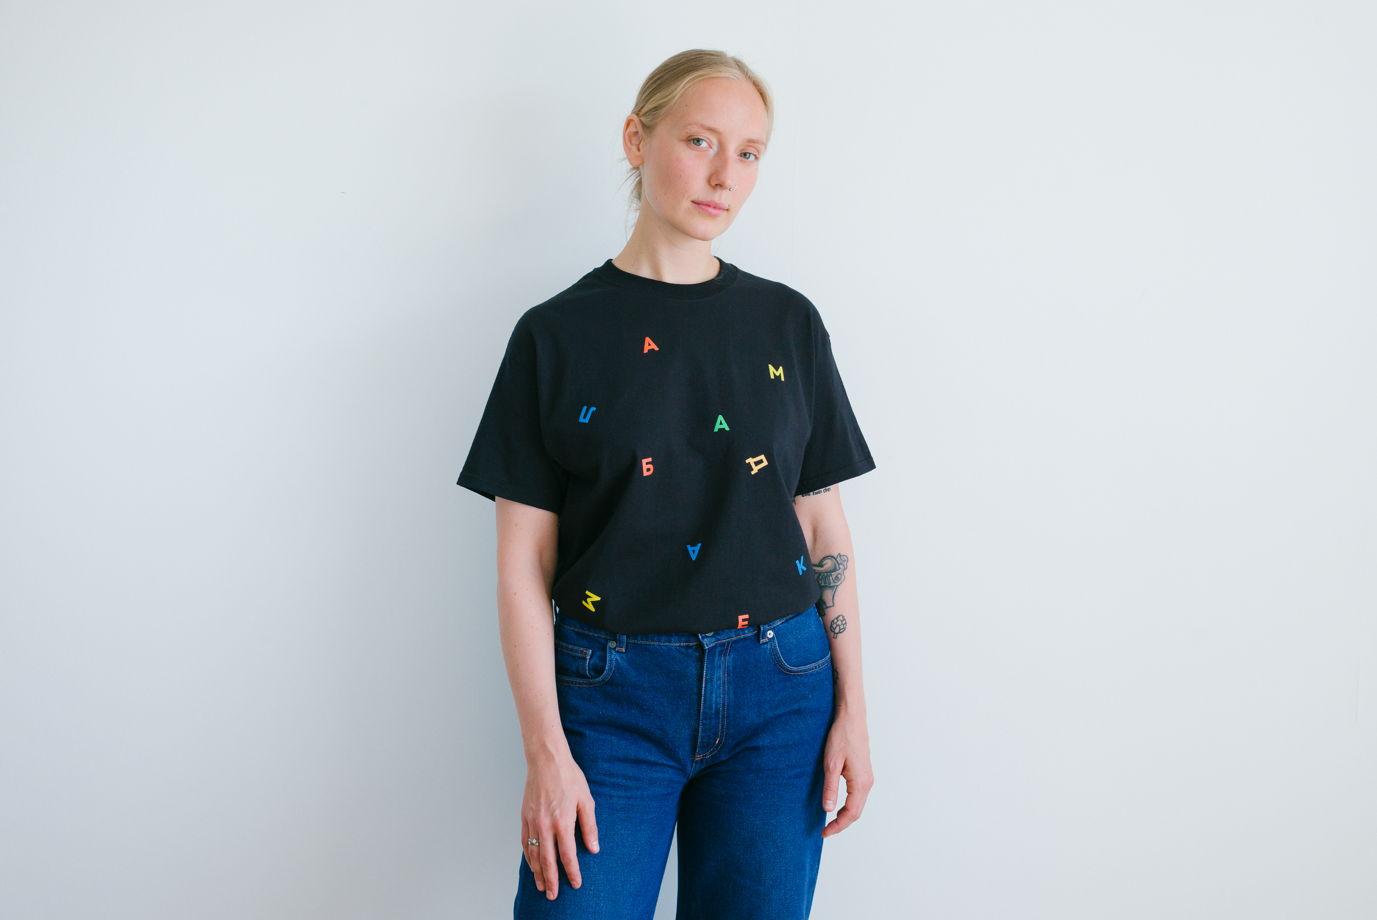 Черная футболка «Буквы»